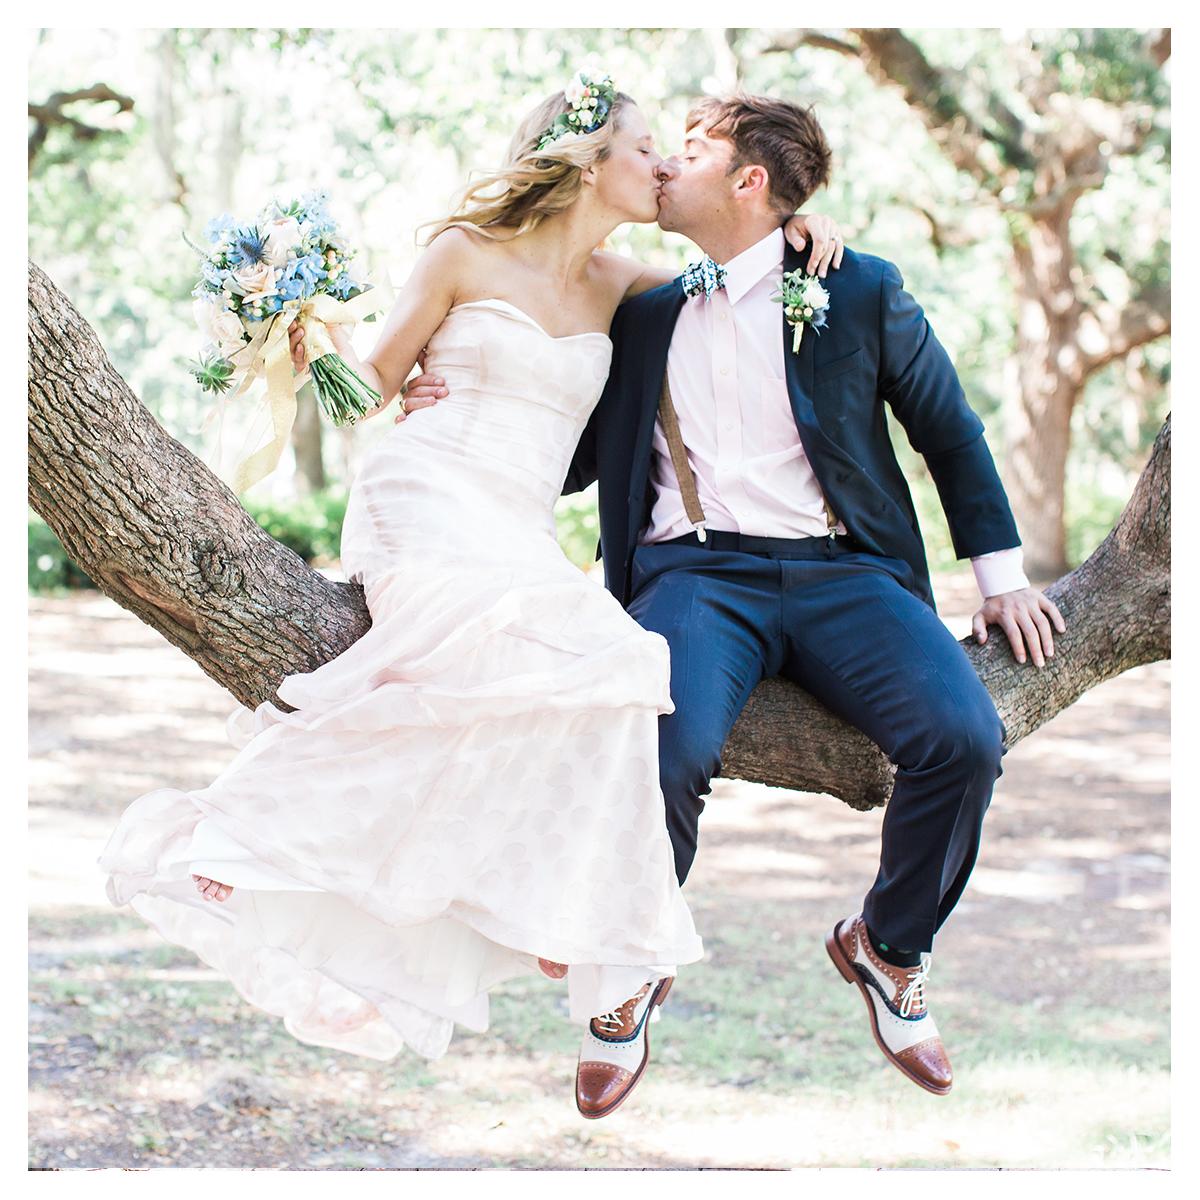 eve-pat-forsyth-park-wedding-apt-b-photo-savannah-wedding-photorapher-savannah-elopement-photographer-savannah-weddings.png